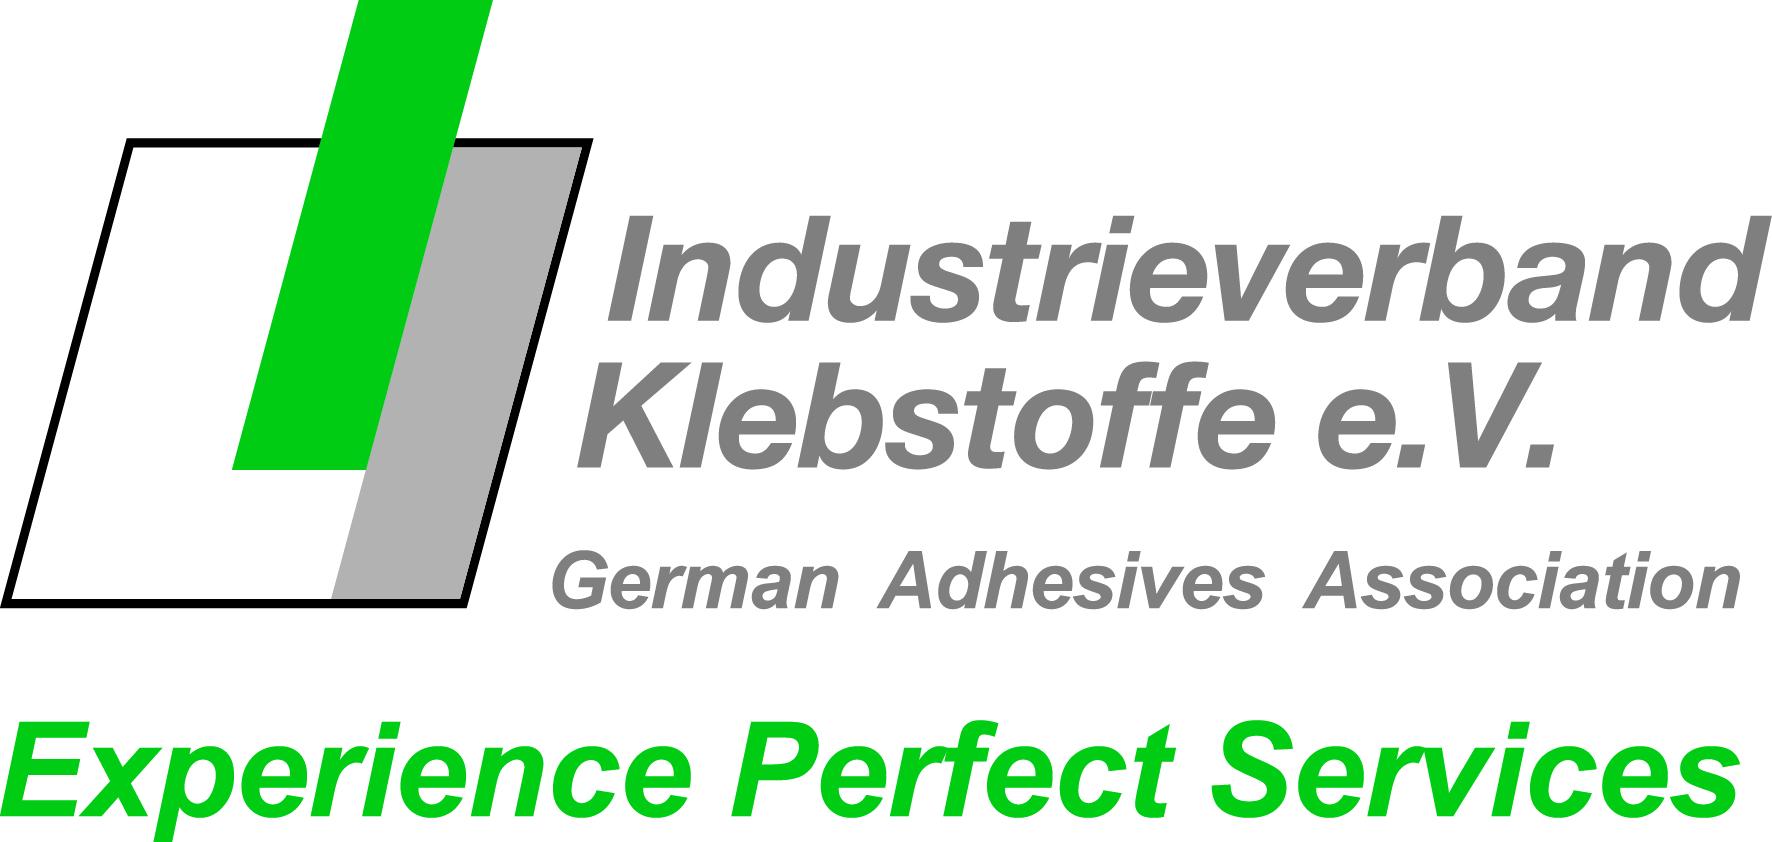 IVK-Industrieverband Klebstoffe e.V. logo